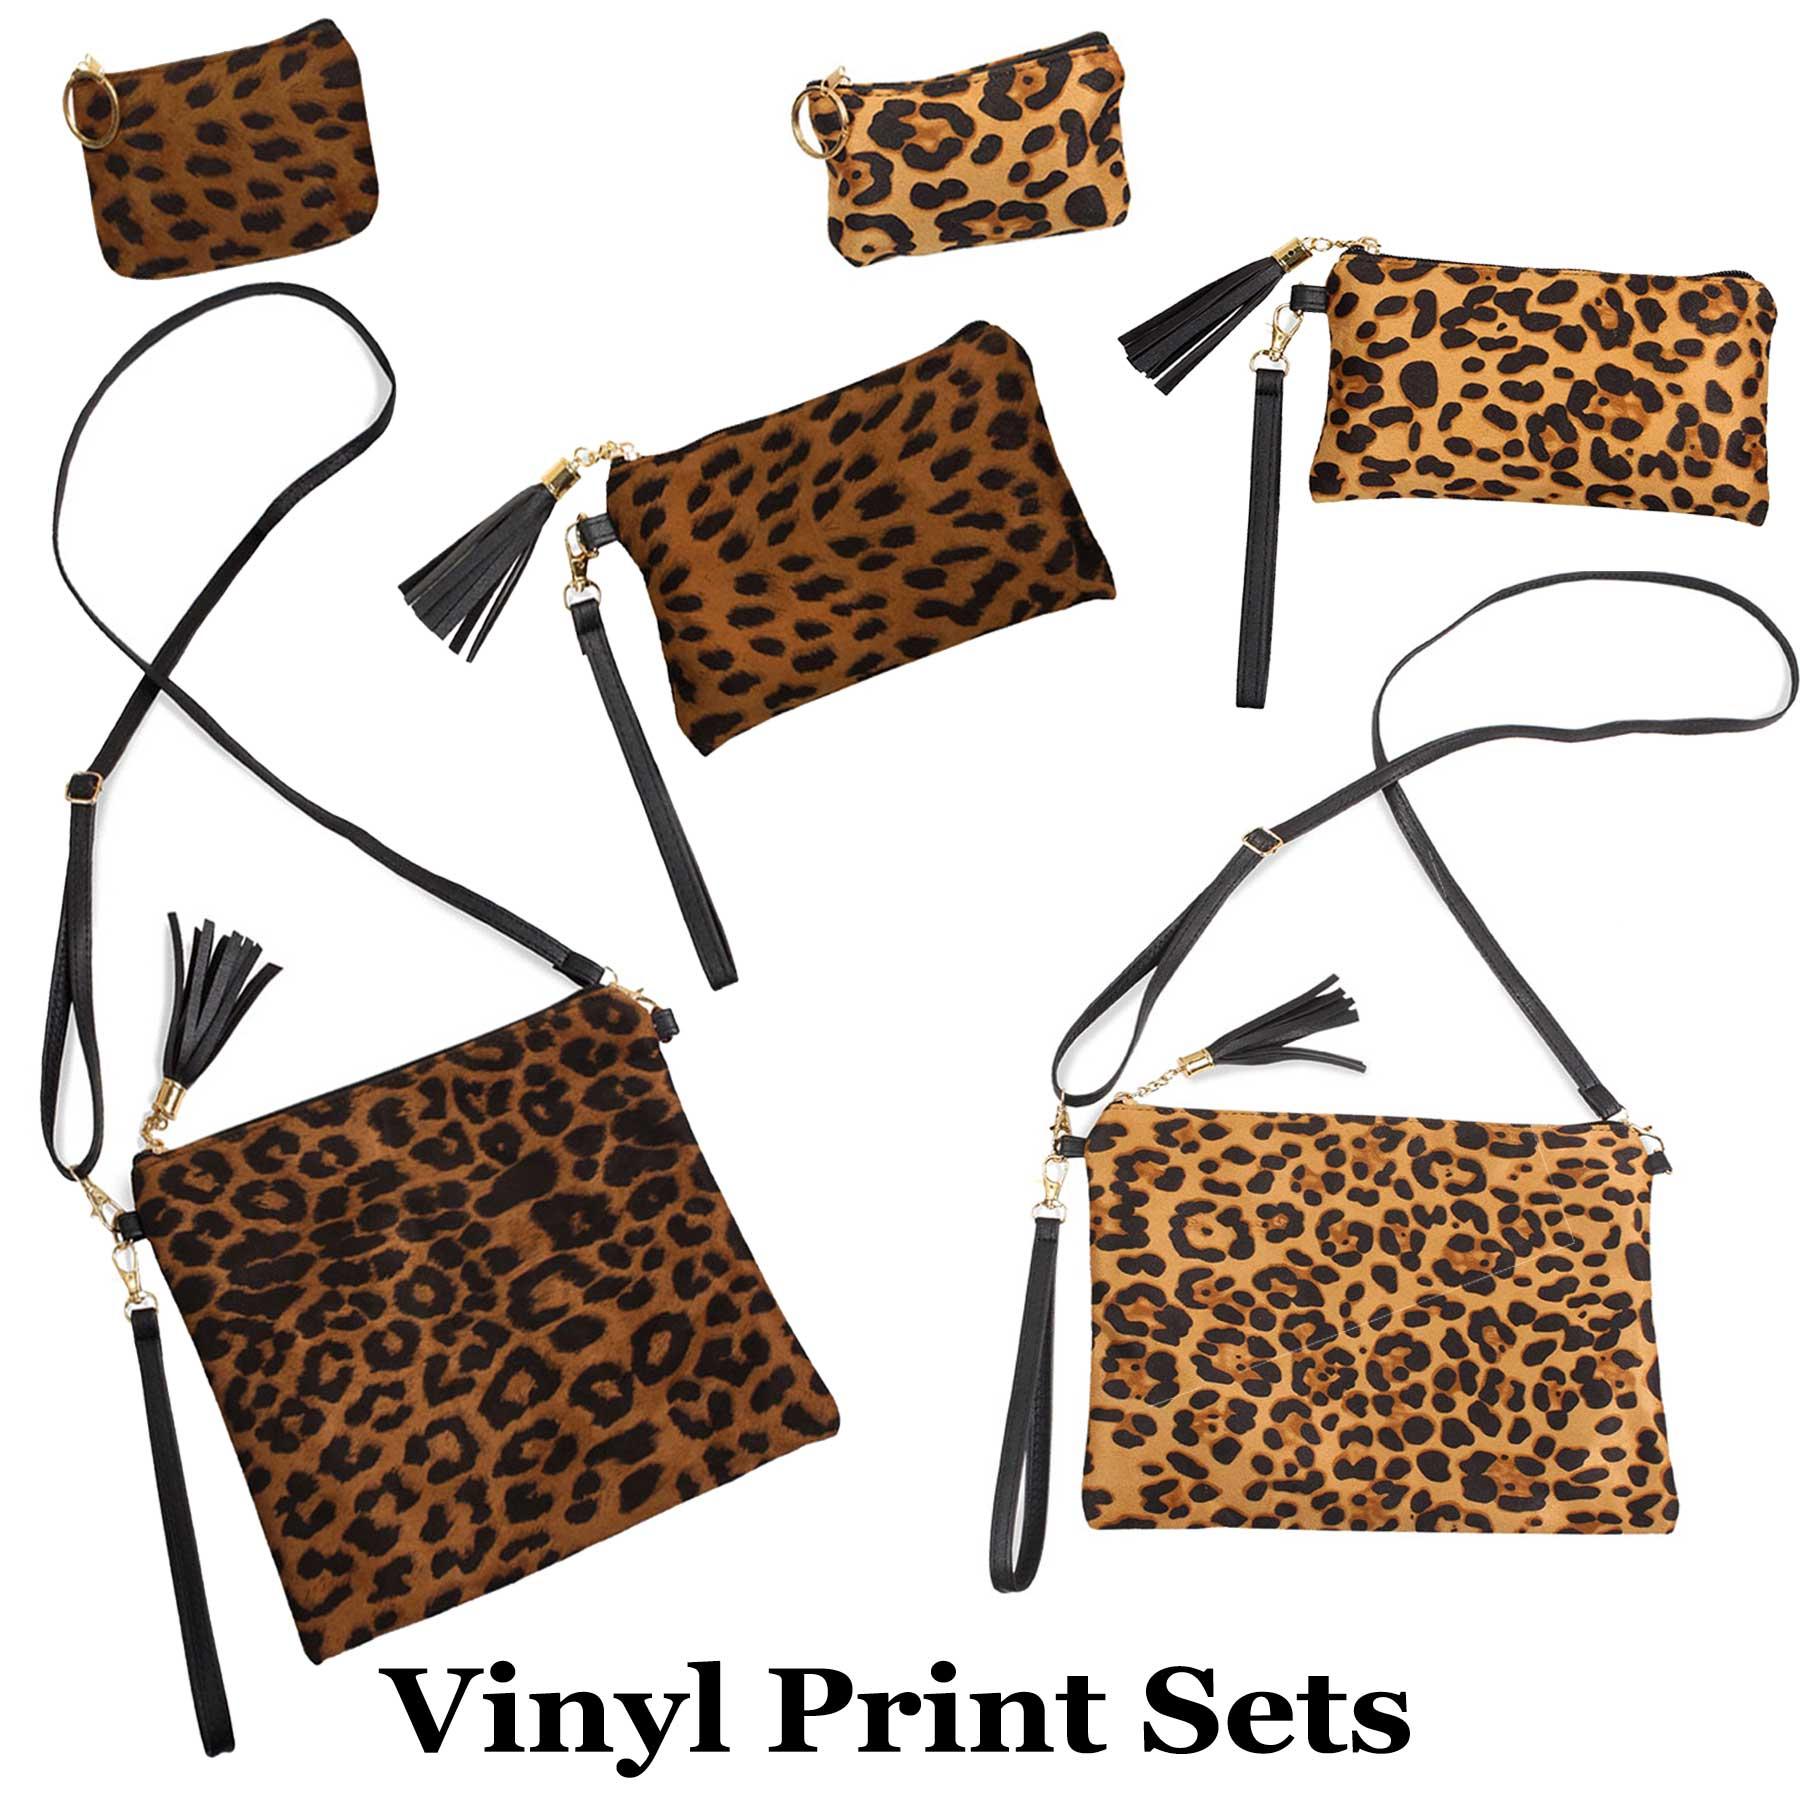 Suede/Vinyl Crossbody Bags, Wristlets+Coin Purses